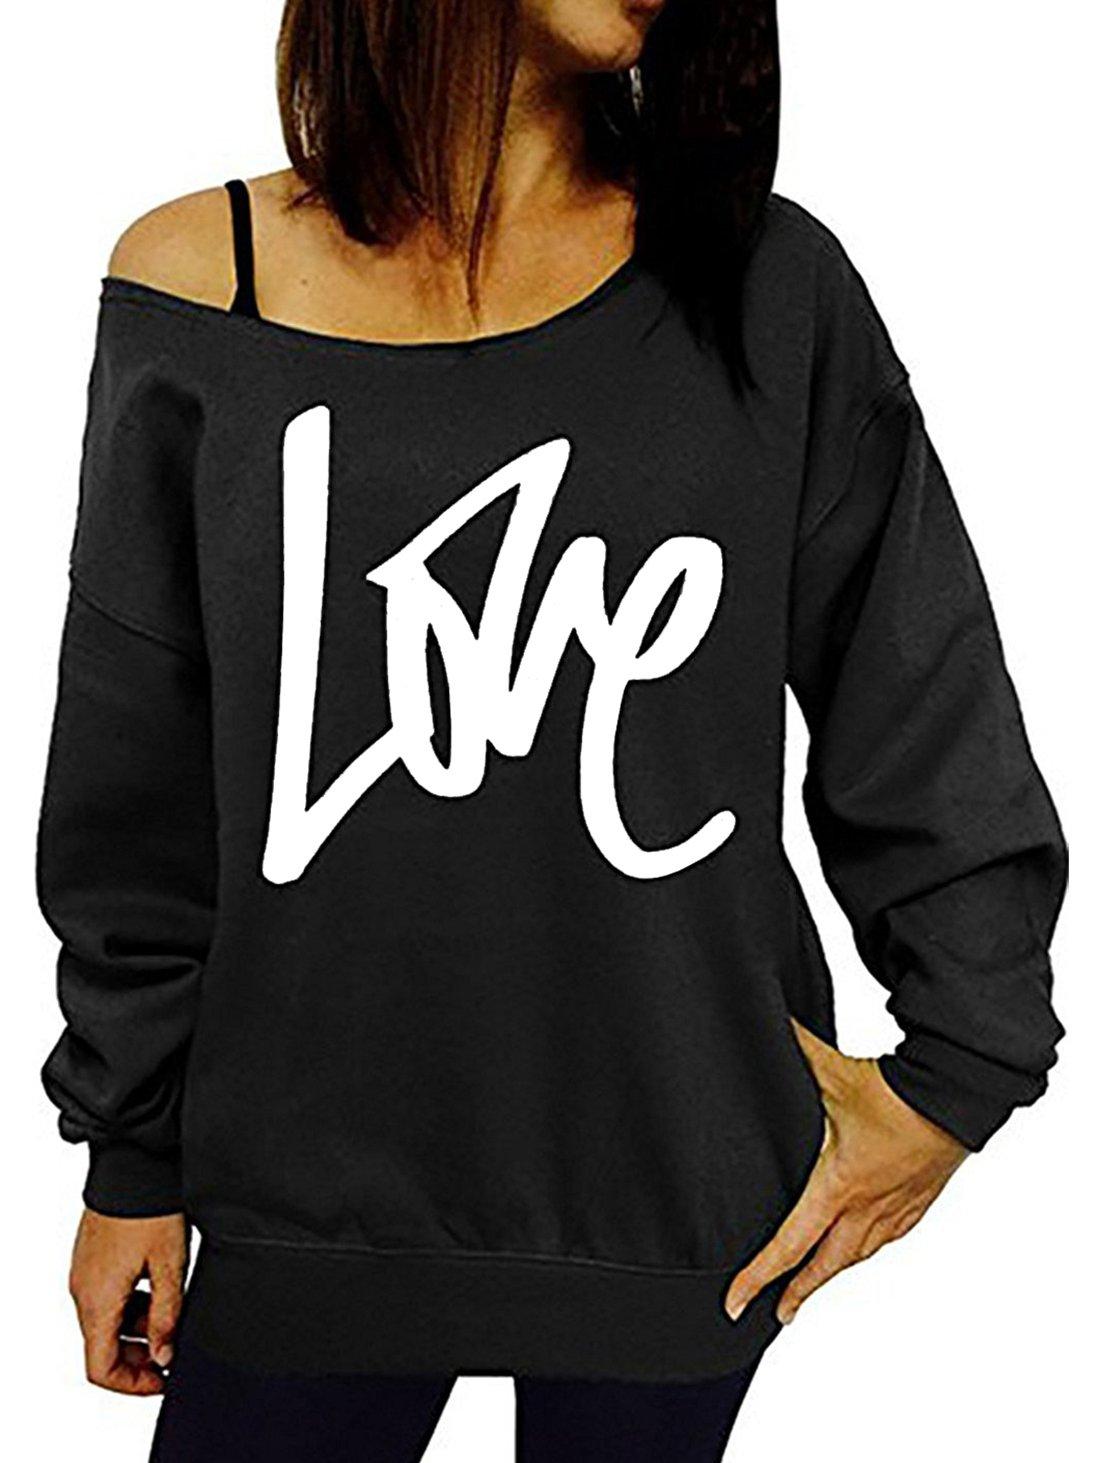 GSVIBK Womens Black Sweatshirts Casual Off Shoulder Sweatshirt Letter Printed Shirts Top Pullover Slouchy Black 203-3XL